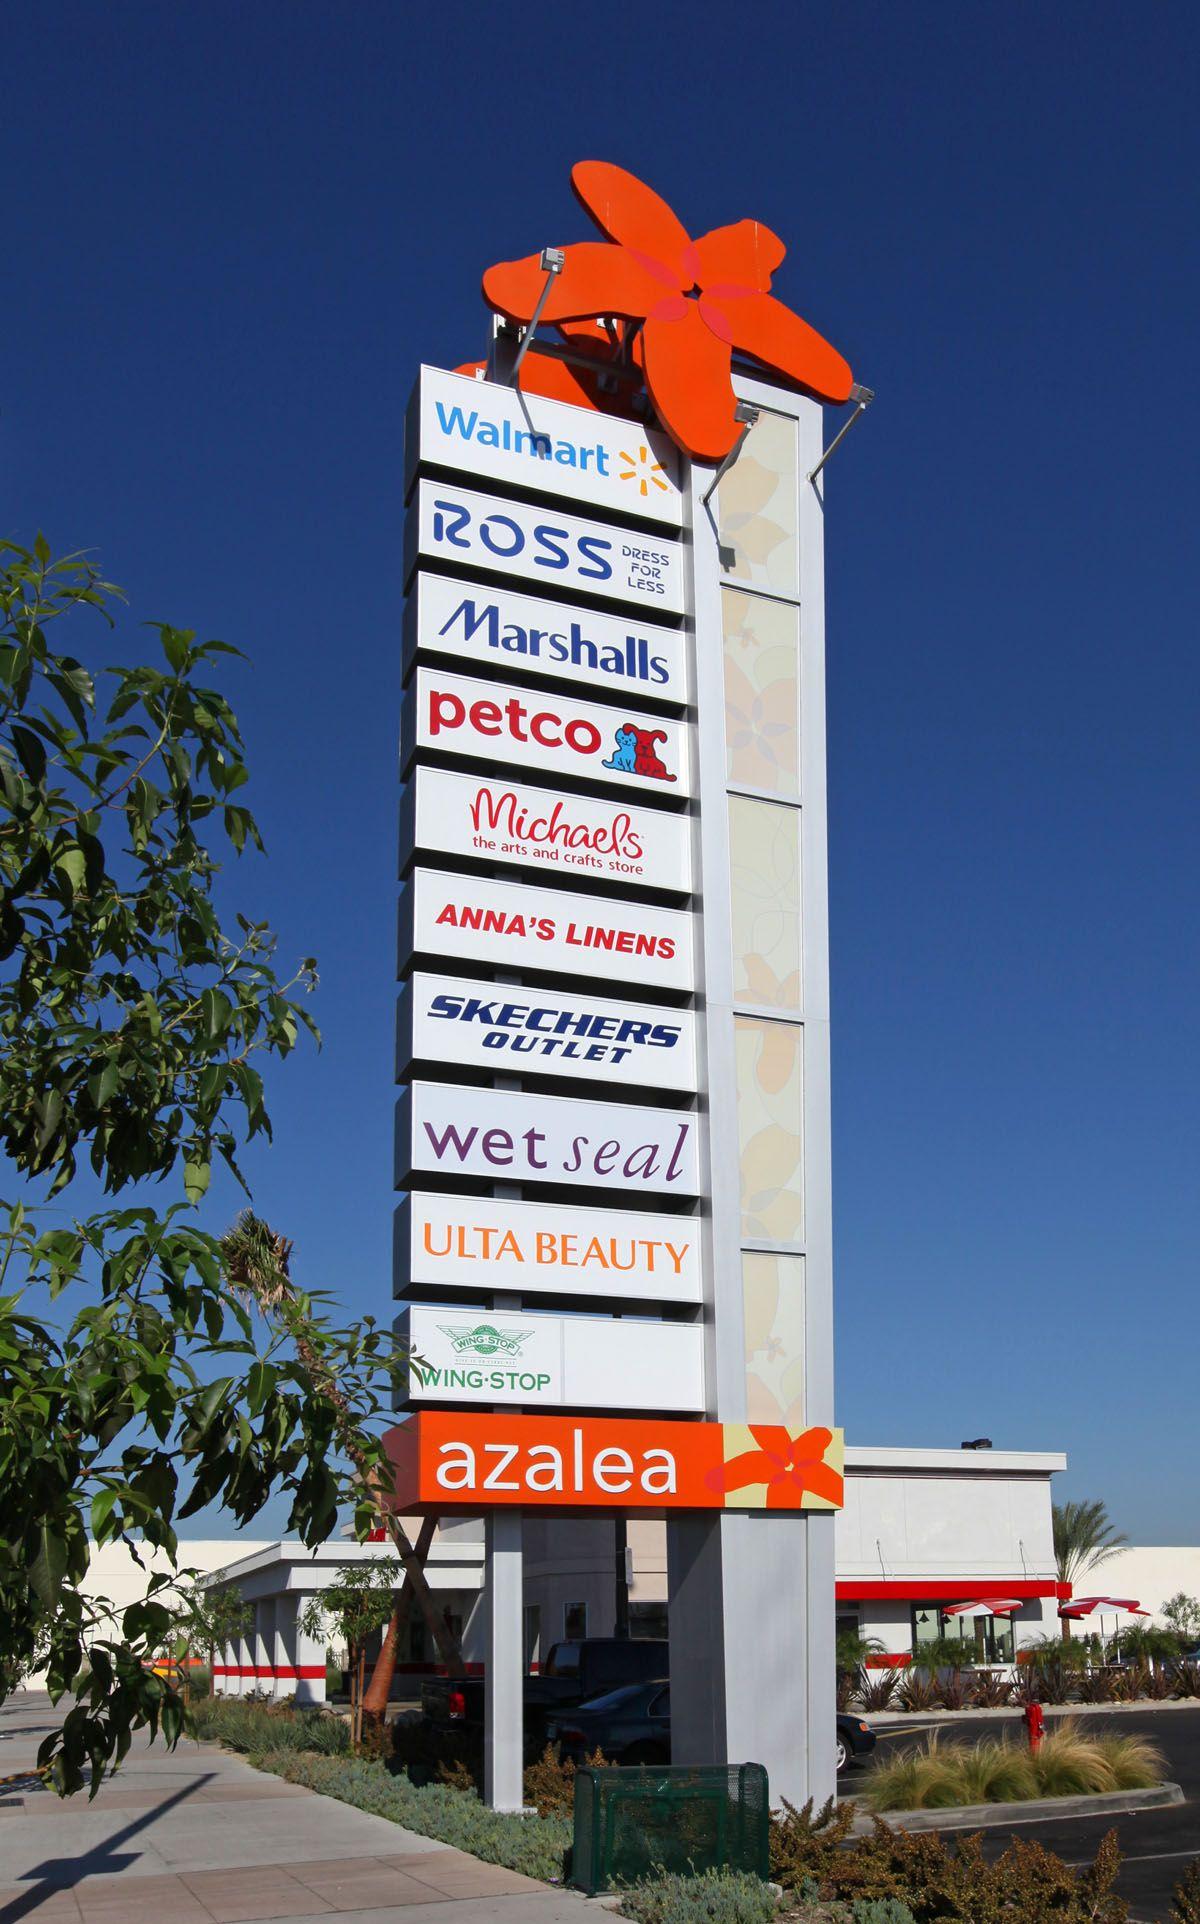 pin by cdpc on azalea regional shopping center pinterest